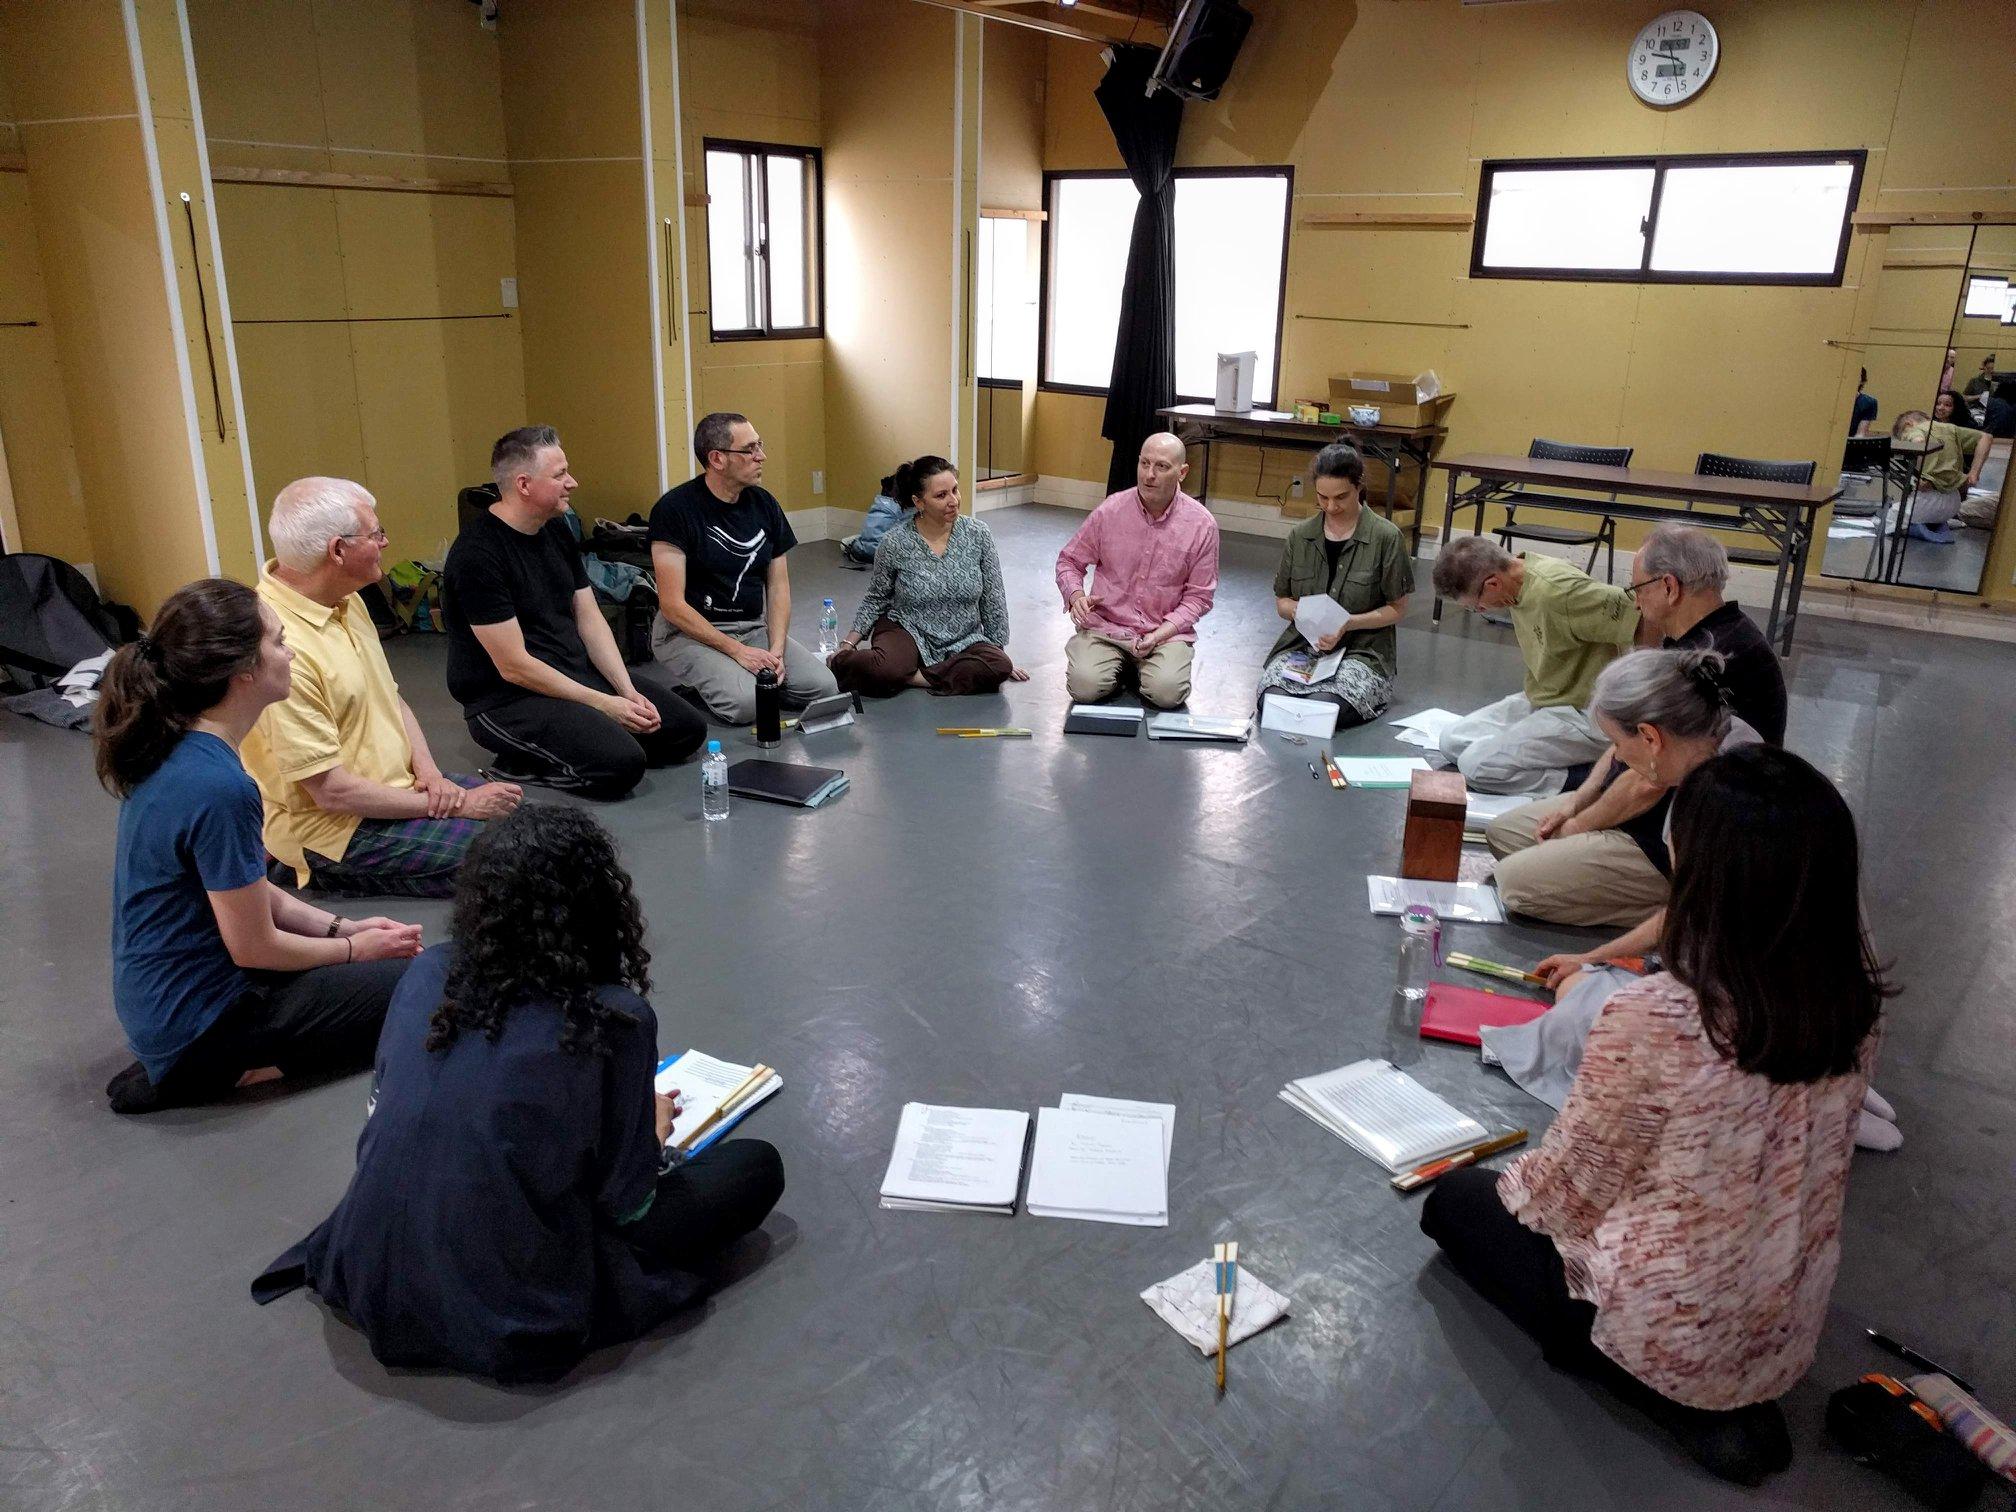 The Theatre Nohgaku Company kicking off rehearsals at Ryogoku Bear (両国BEAR) in Tokyo.